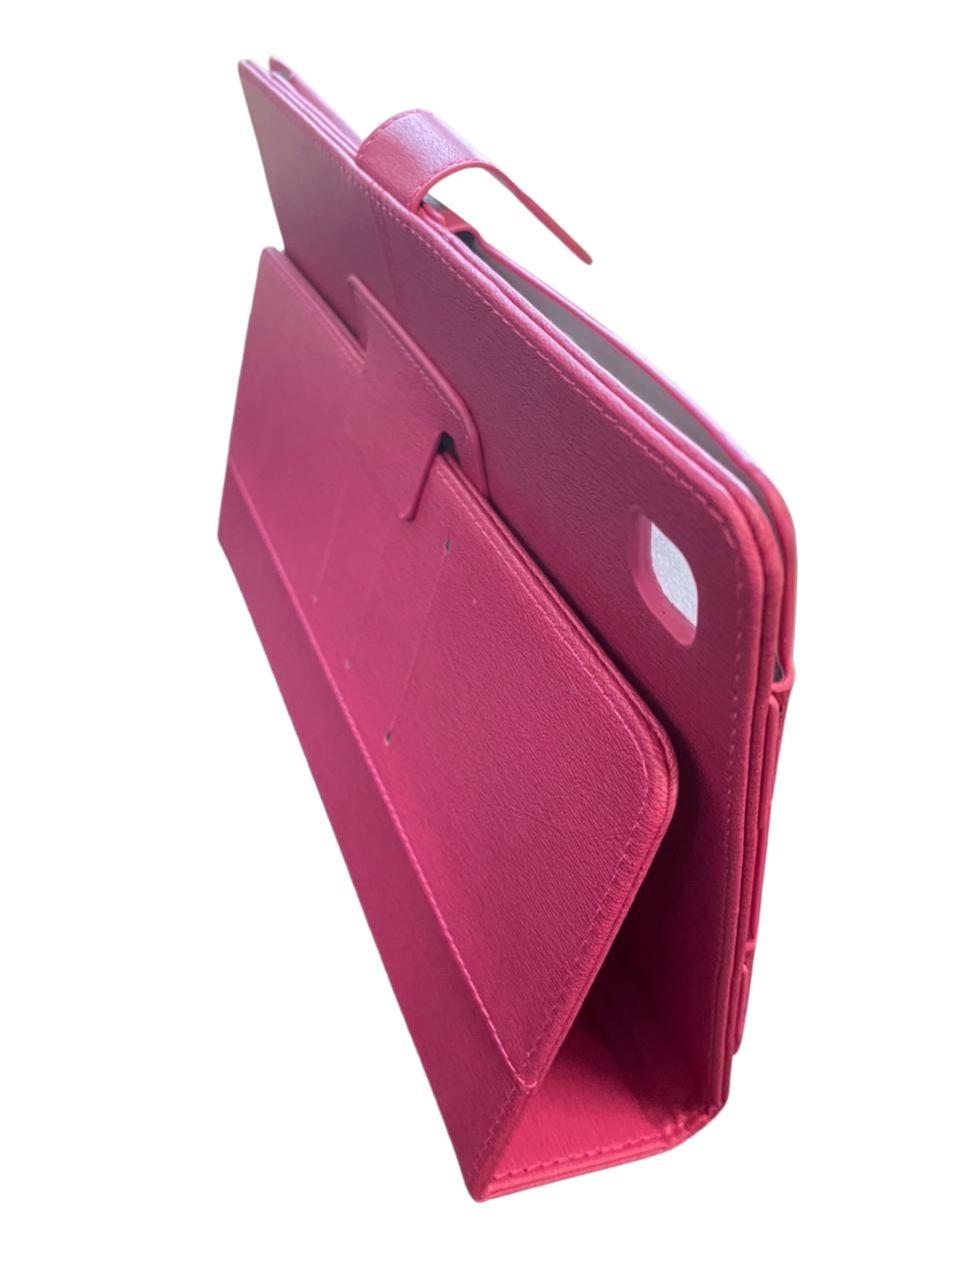 Capa Tablet Samsung Galaxy Tab A7 10.4 T500 T505 Magnética Carteira Dobrável Colors